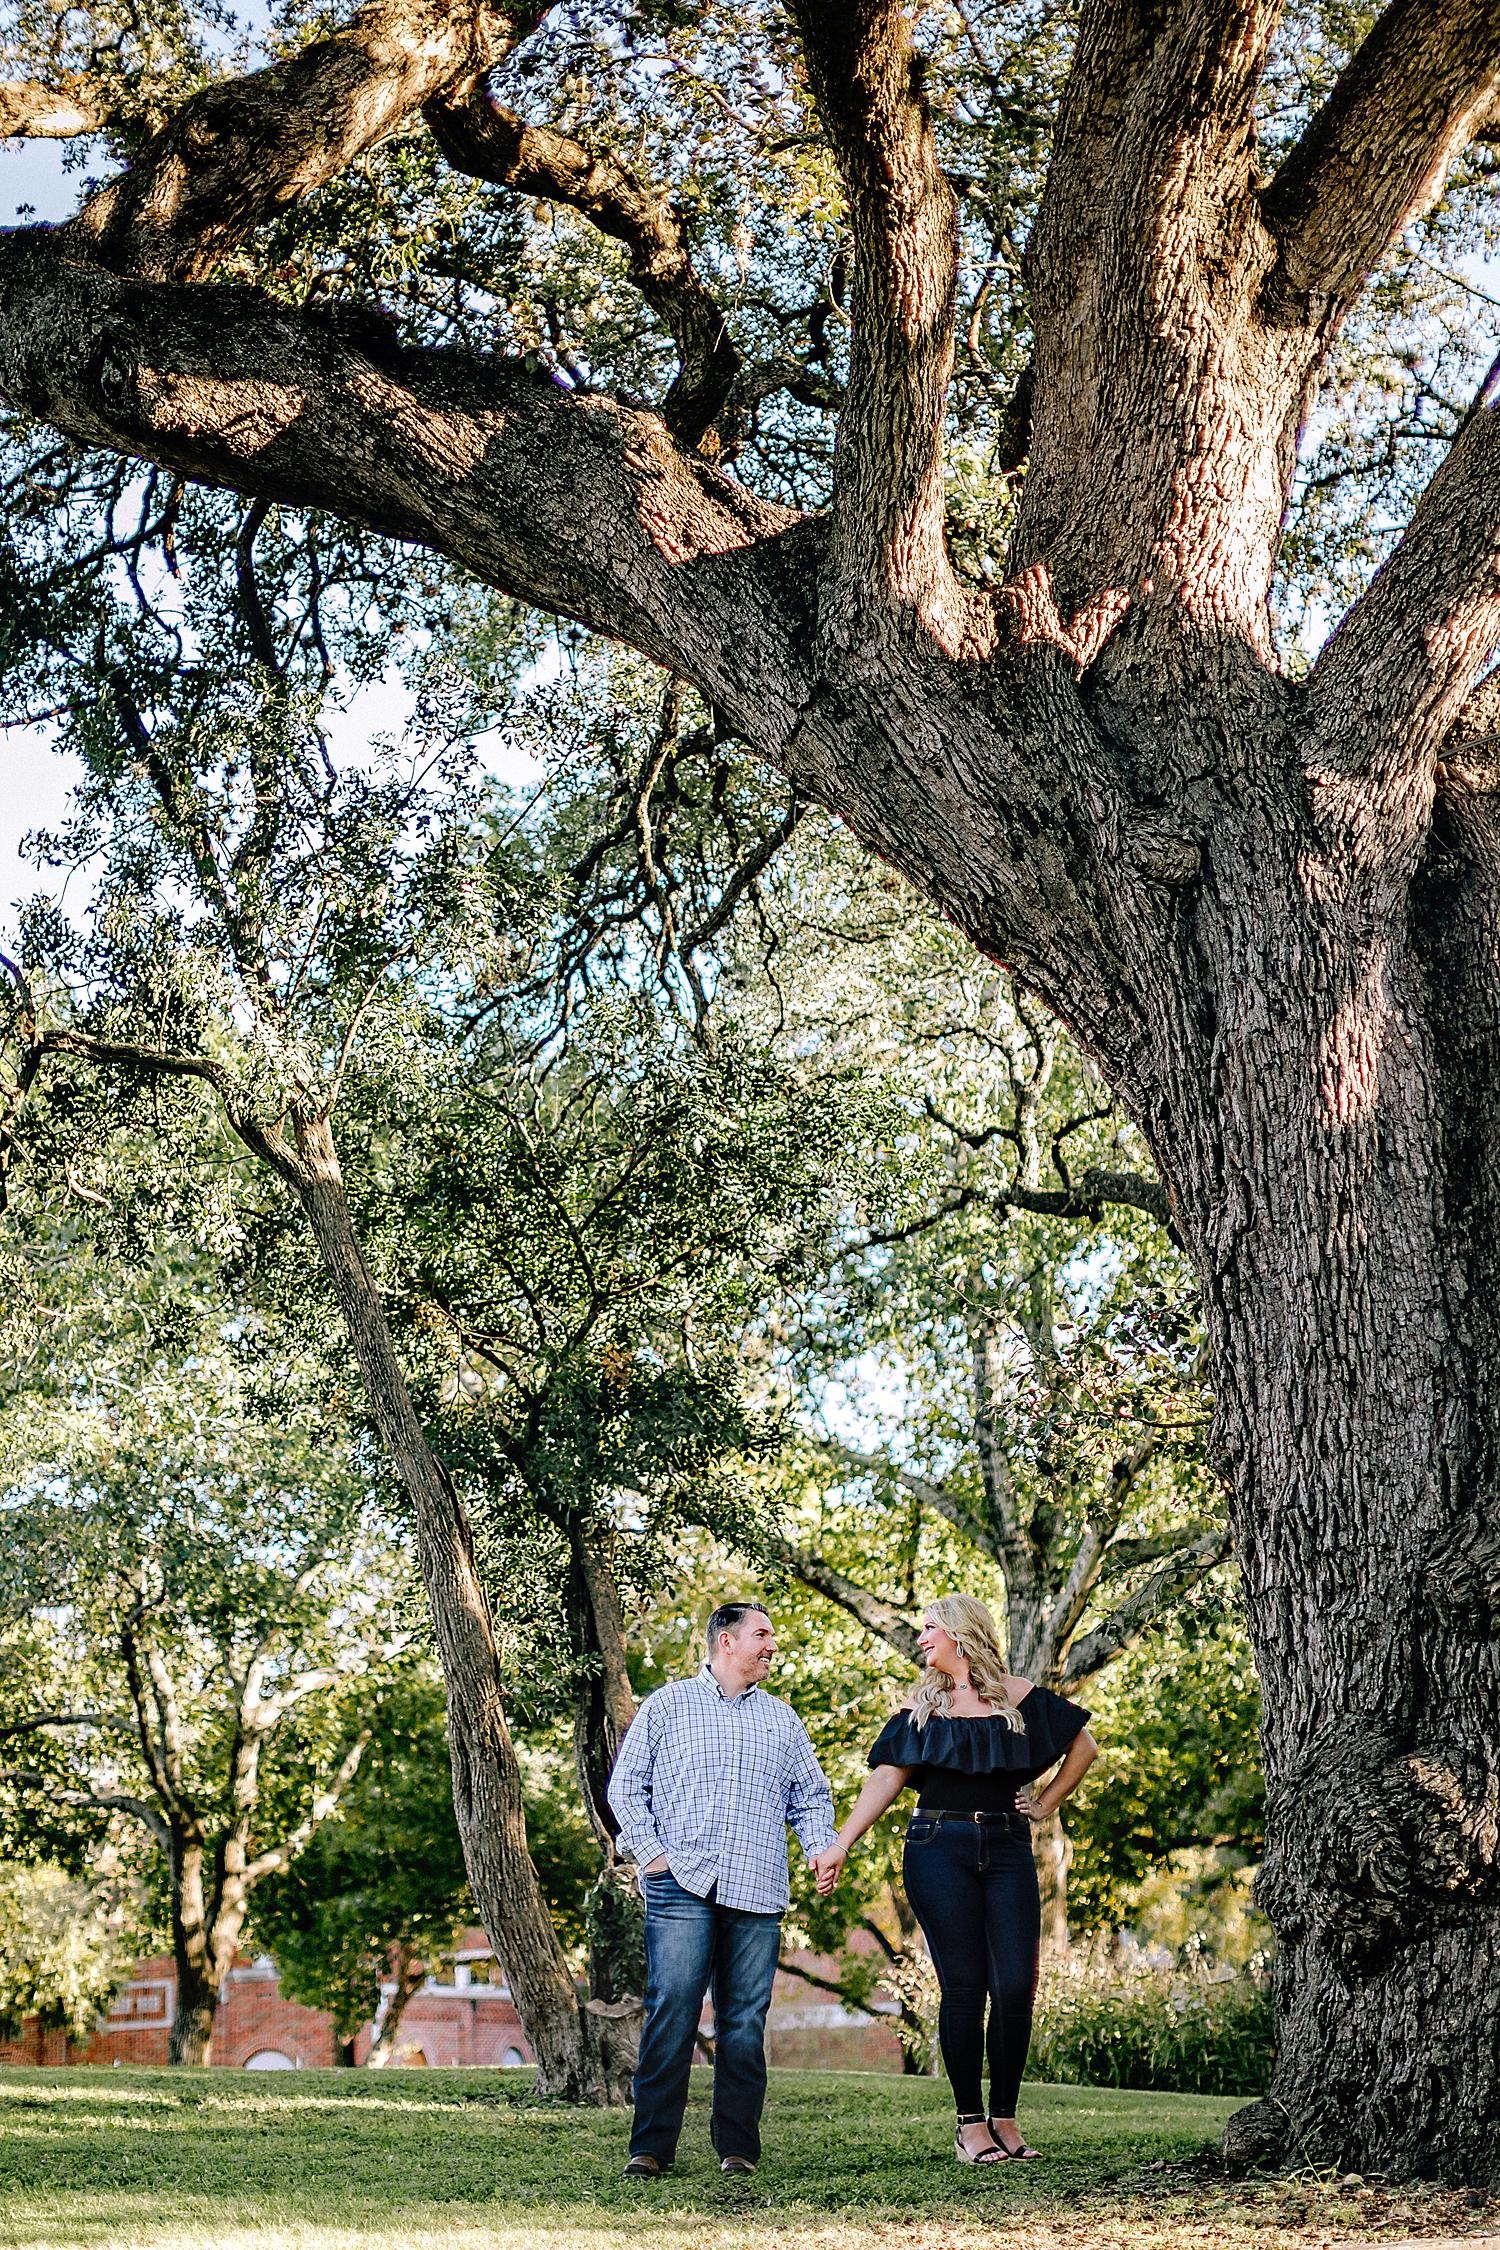 Engagement-Photo-Session-University-of-Incarnate-Word-UIW-San-Antonio-Texas-Carly-Barton-Photography_0025.jpg